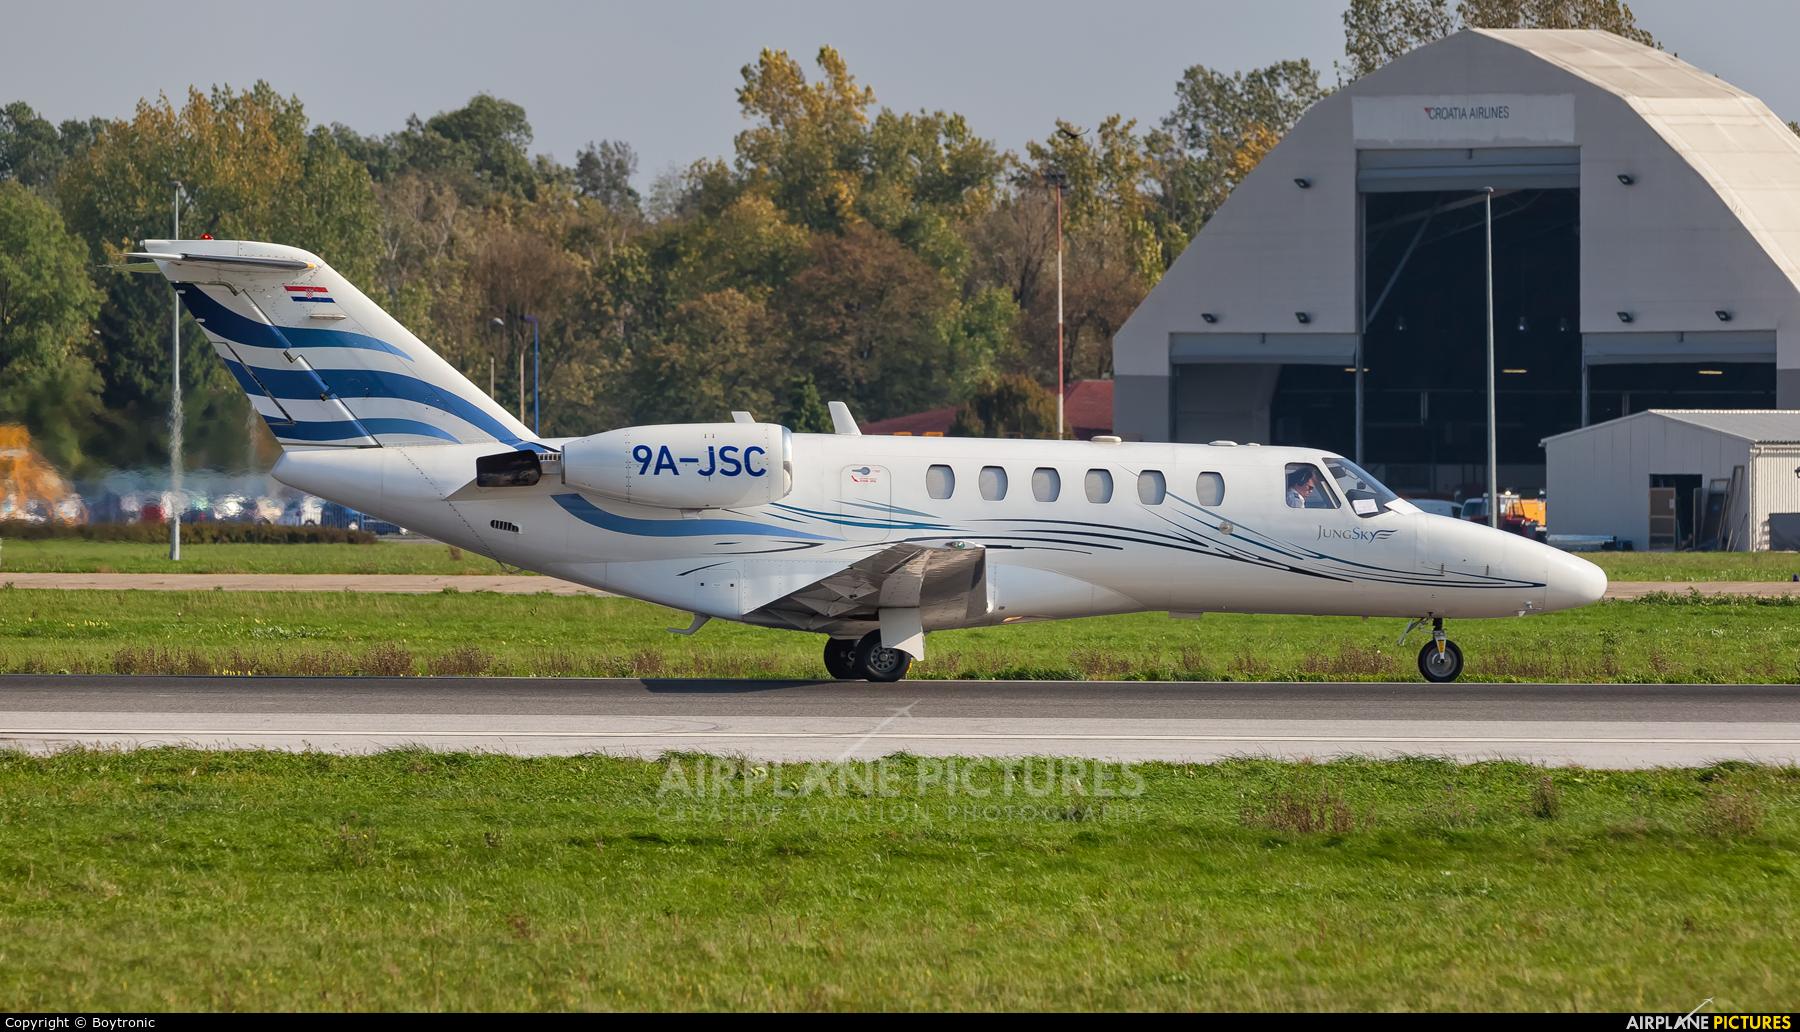 Jung Sky 9A-JSC aircraft at Zagreb